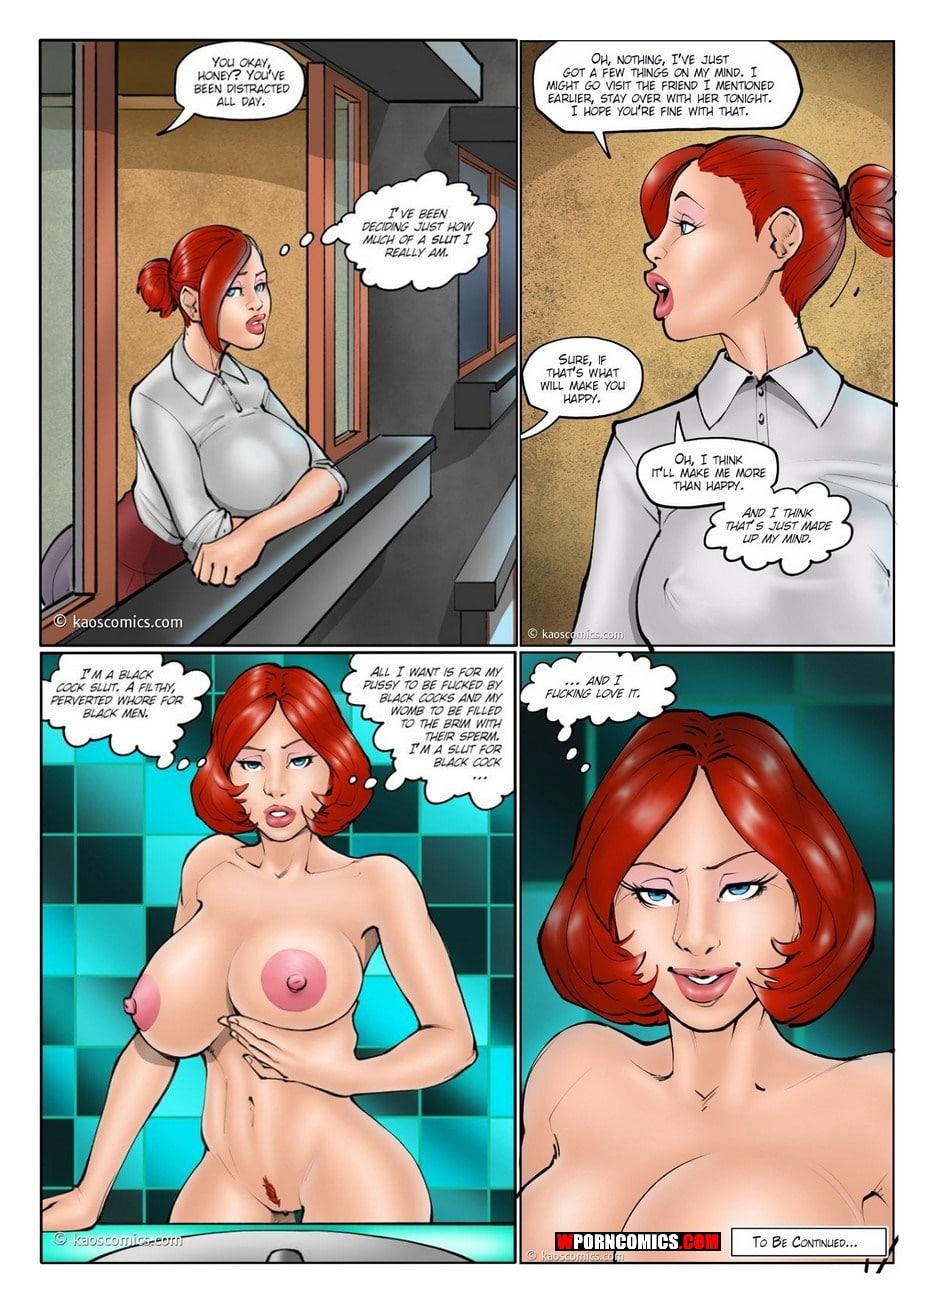 porn-comic-annabelle-new-life-part-1-2020-03-17/porn-comic-annabelle-new-life-part-1-2020-03-17-17592.jpg